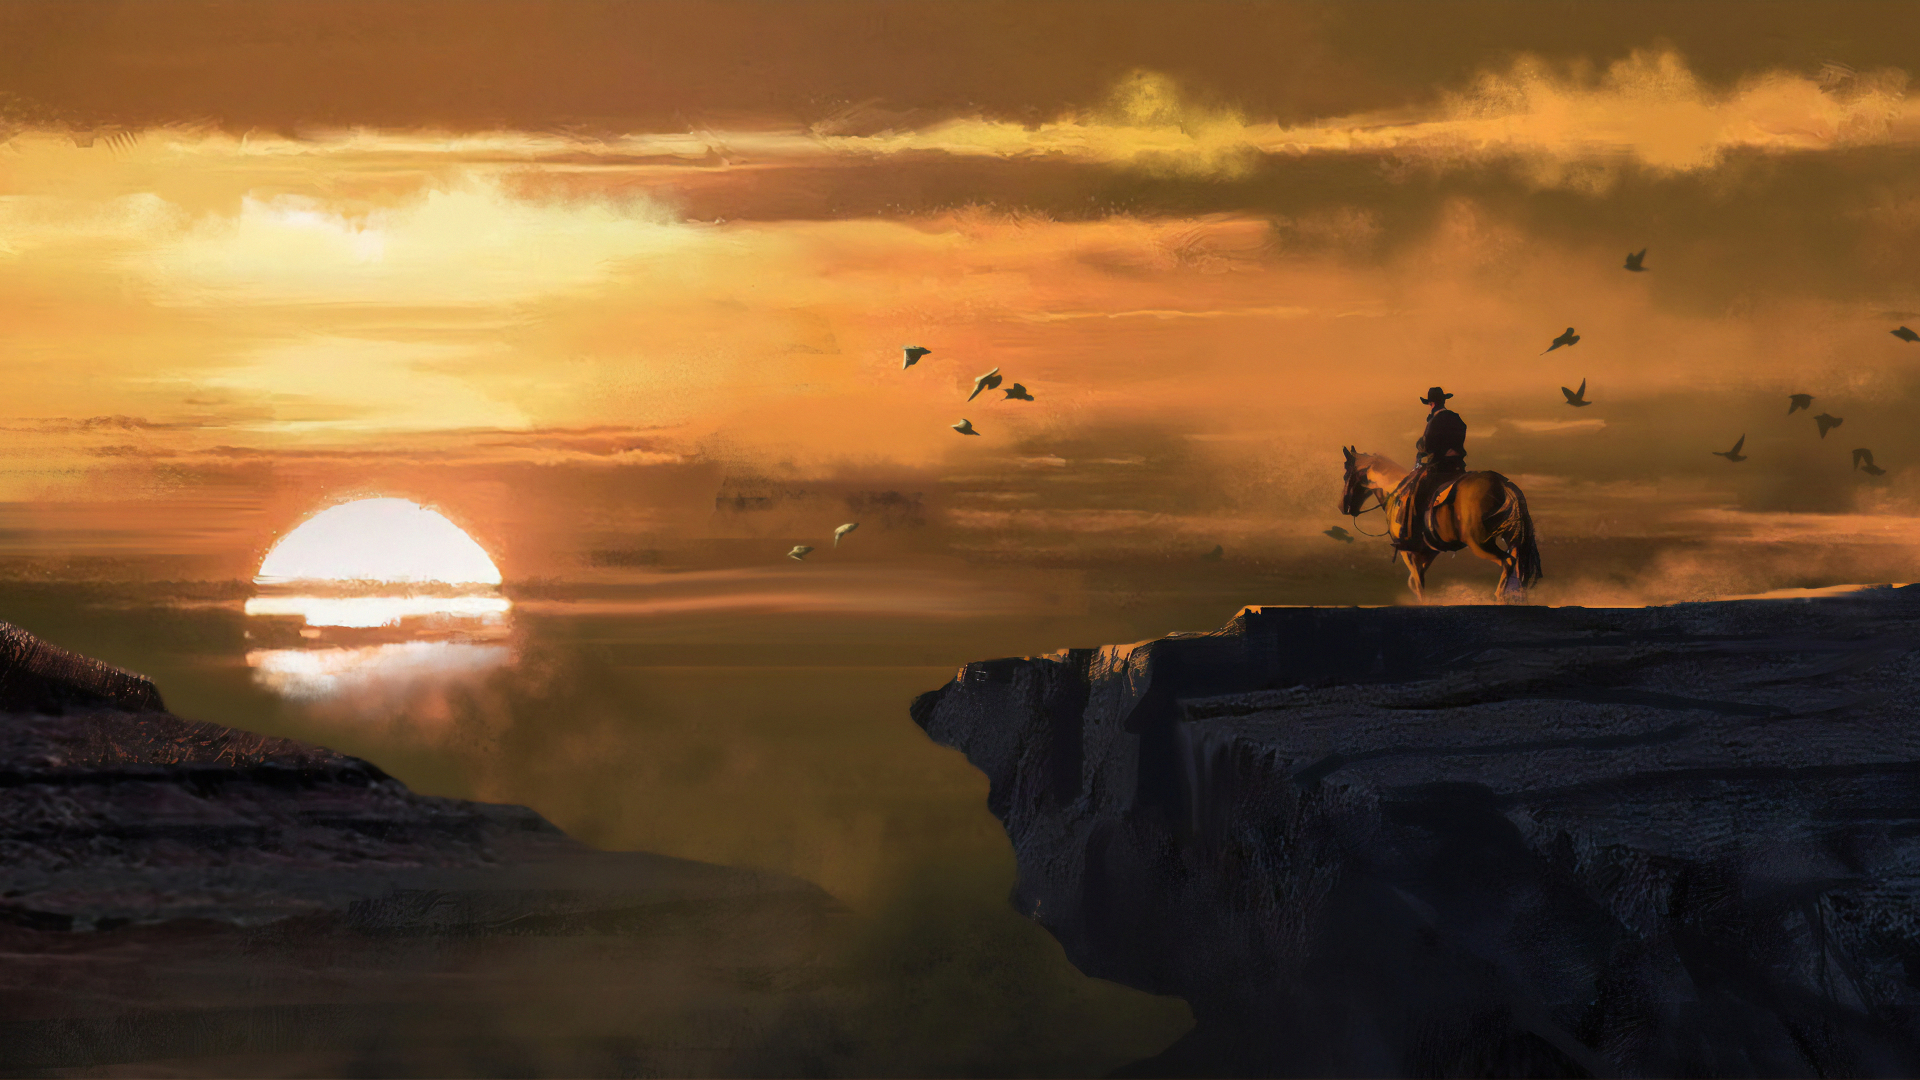 1920x1080 4k Landscape From Red Dead Redemption 1080p Laptop